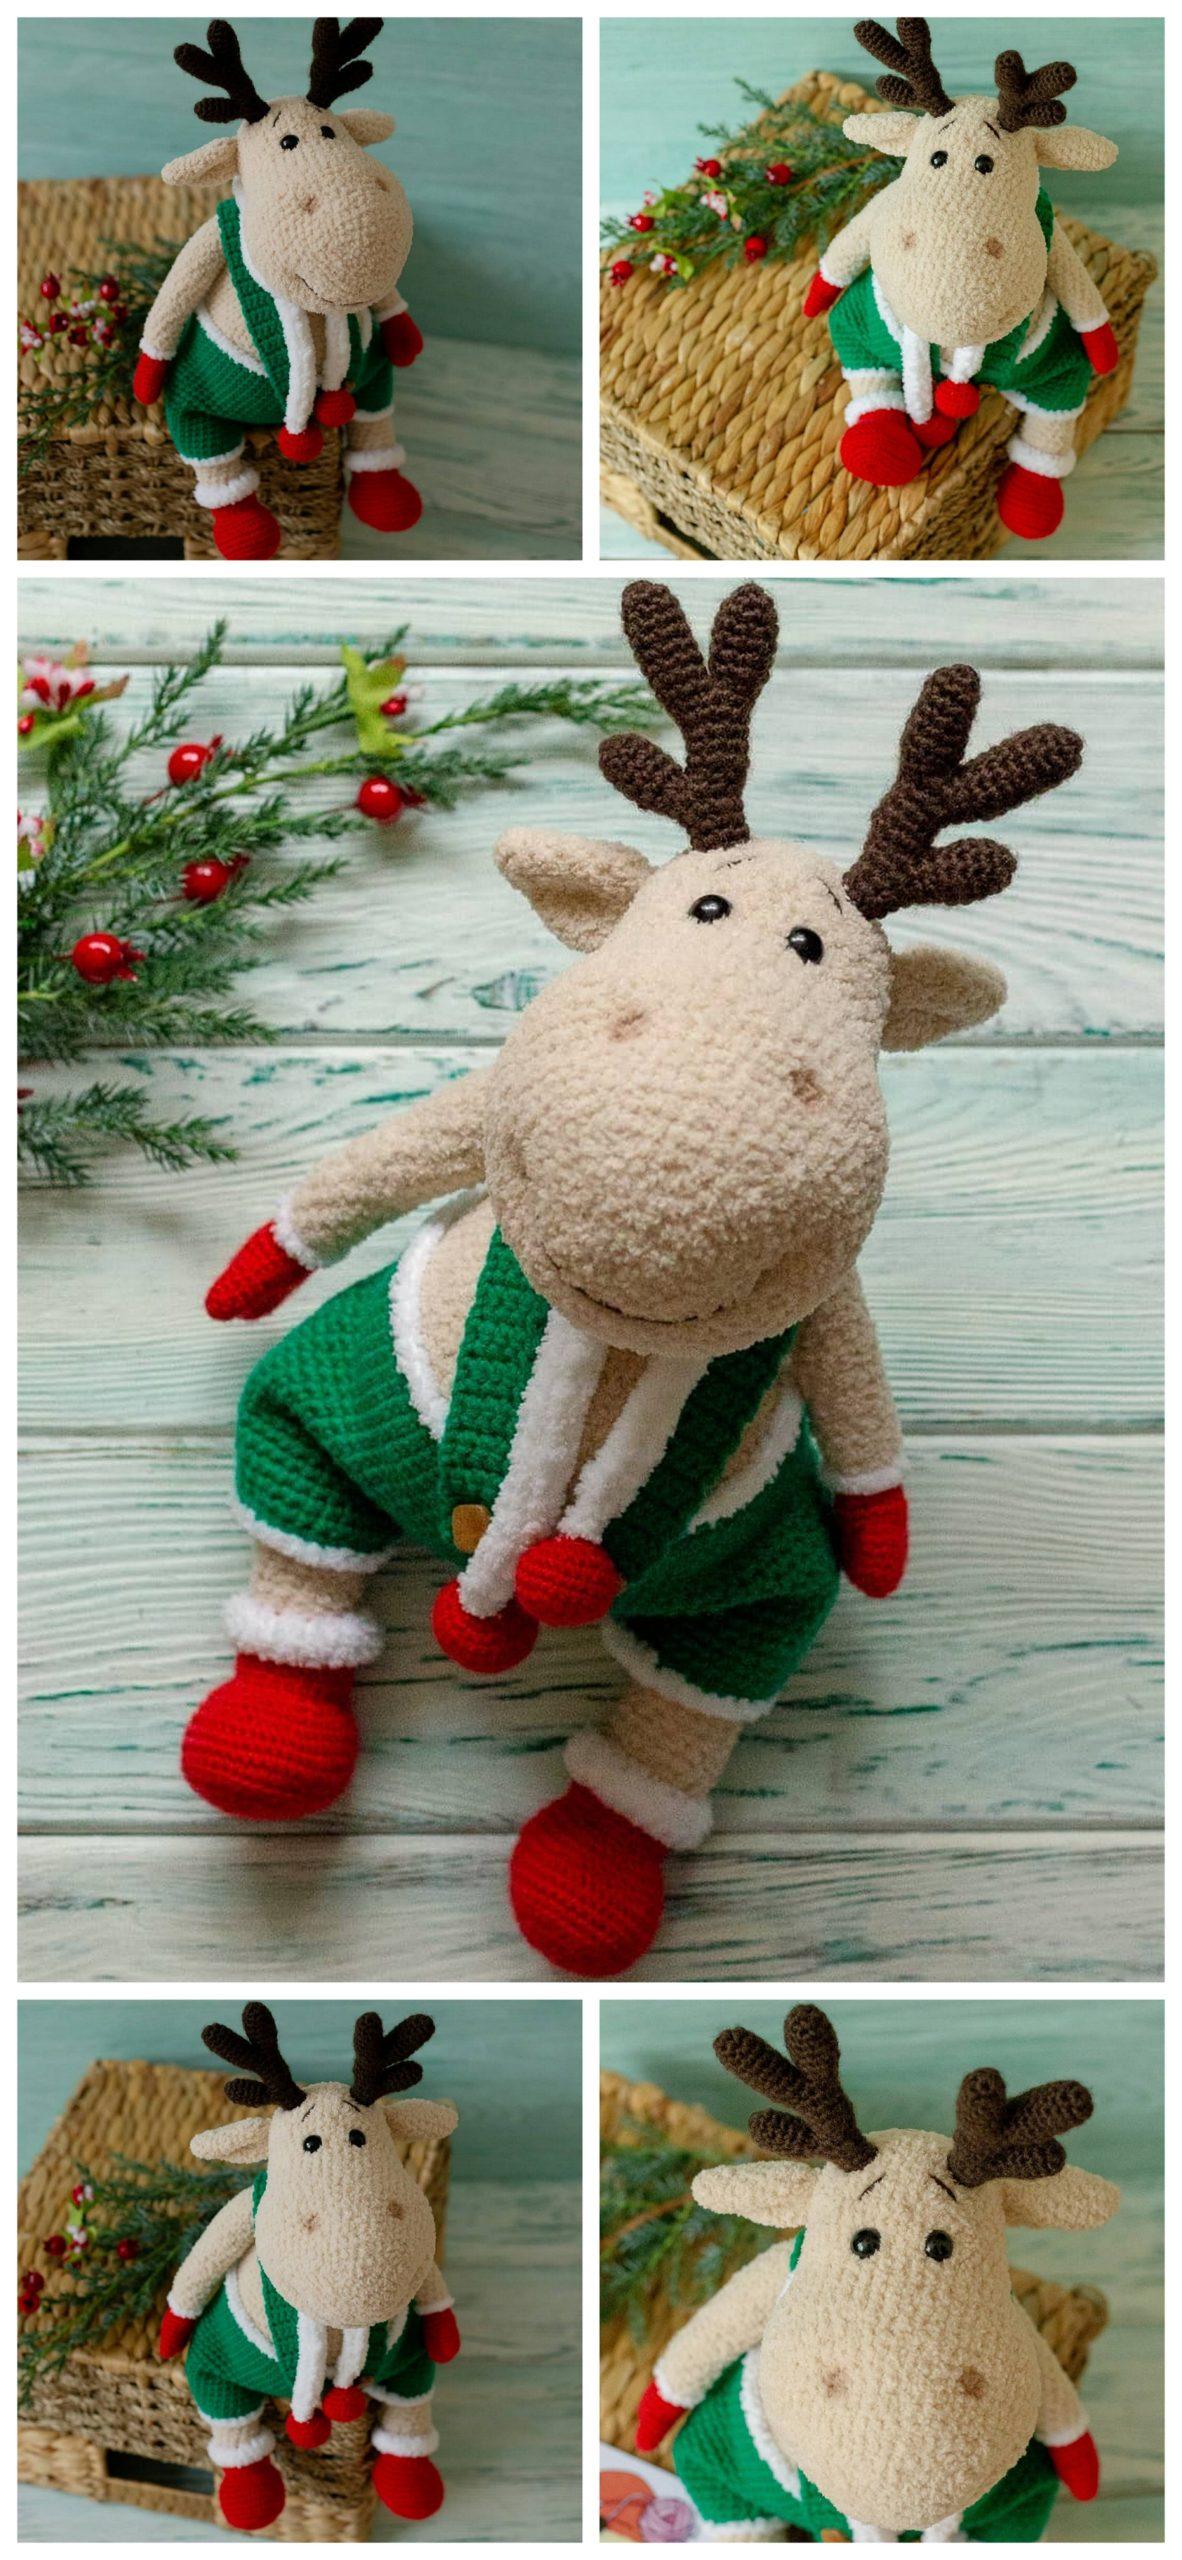 Amigurumi Animal Free Crochet Patterns and Tutorials Videos